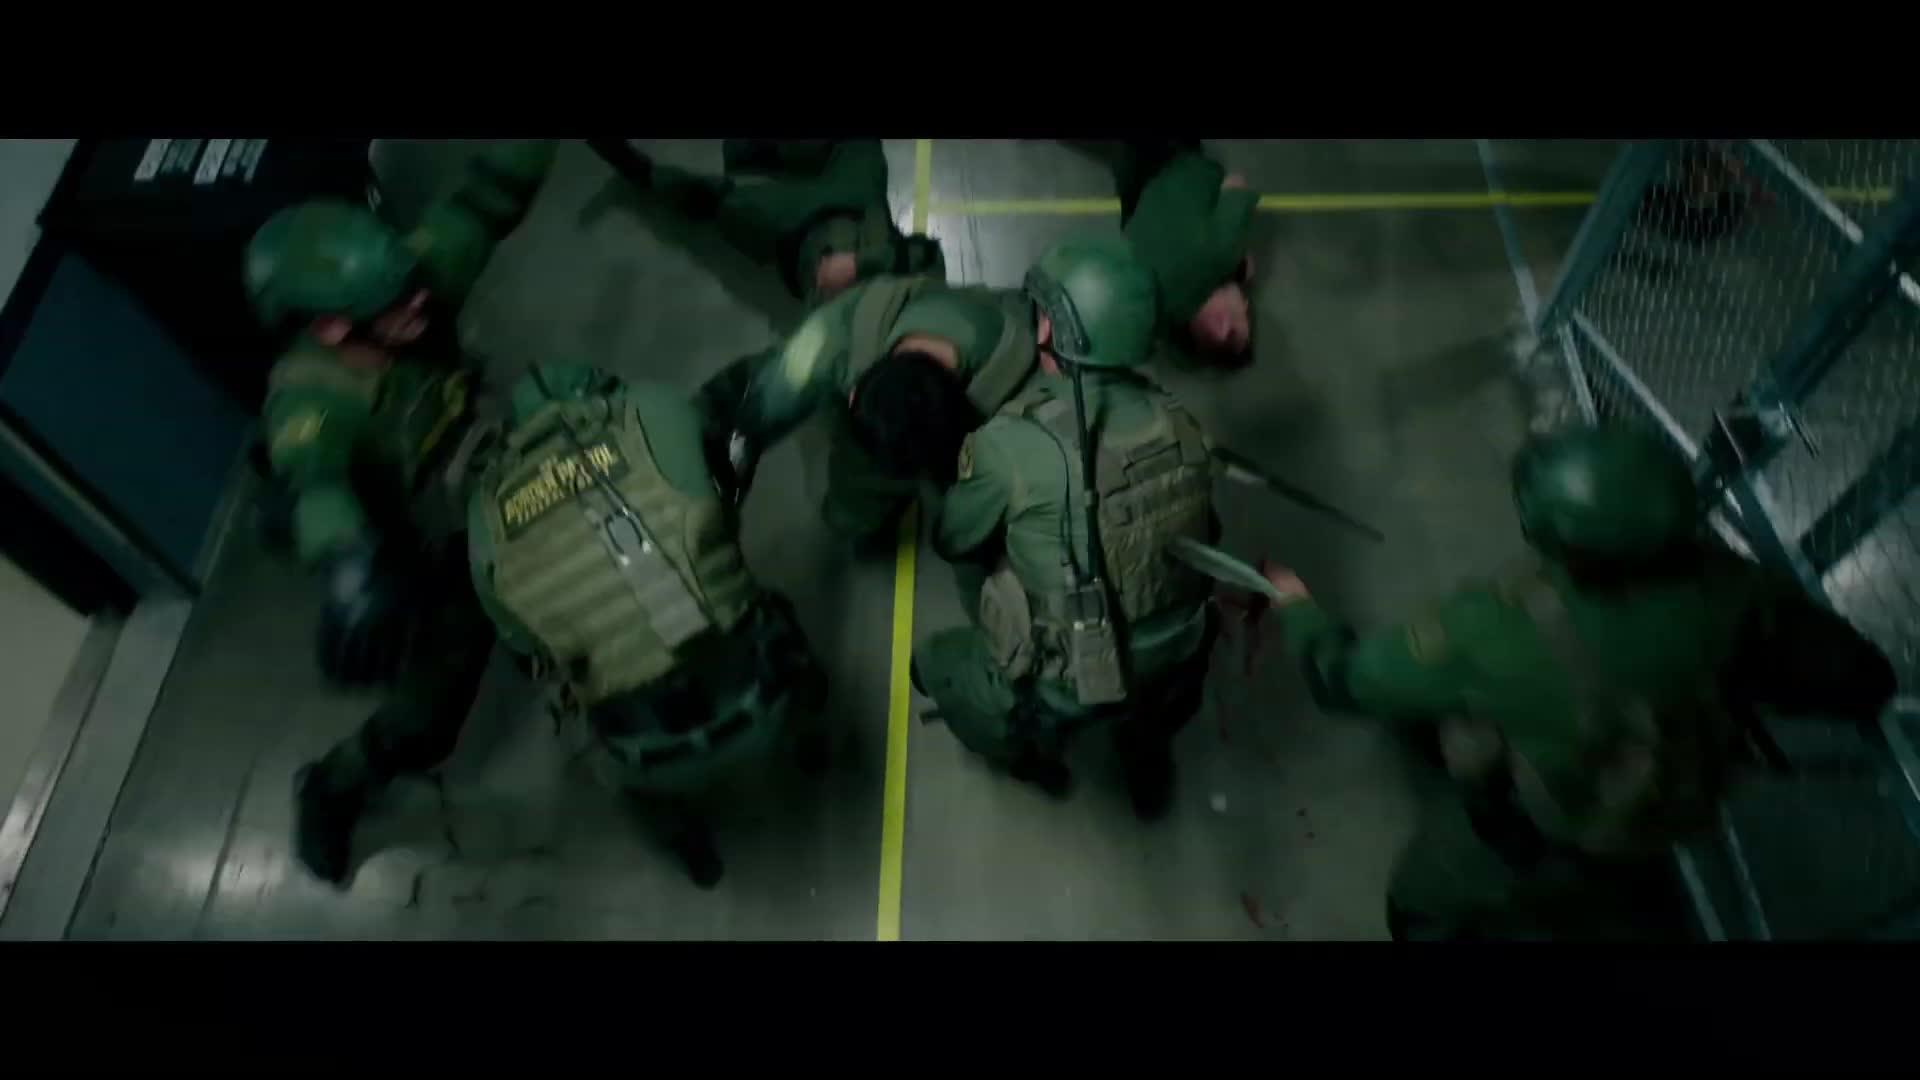 Terminator: Dark Fate - Extended Red Band TV Spot [HD] screen capture